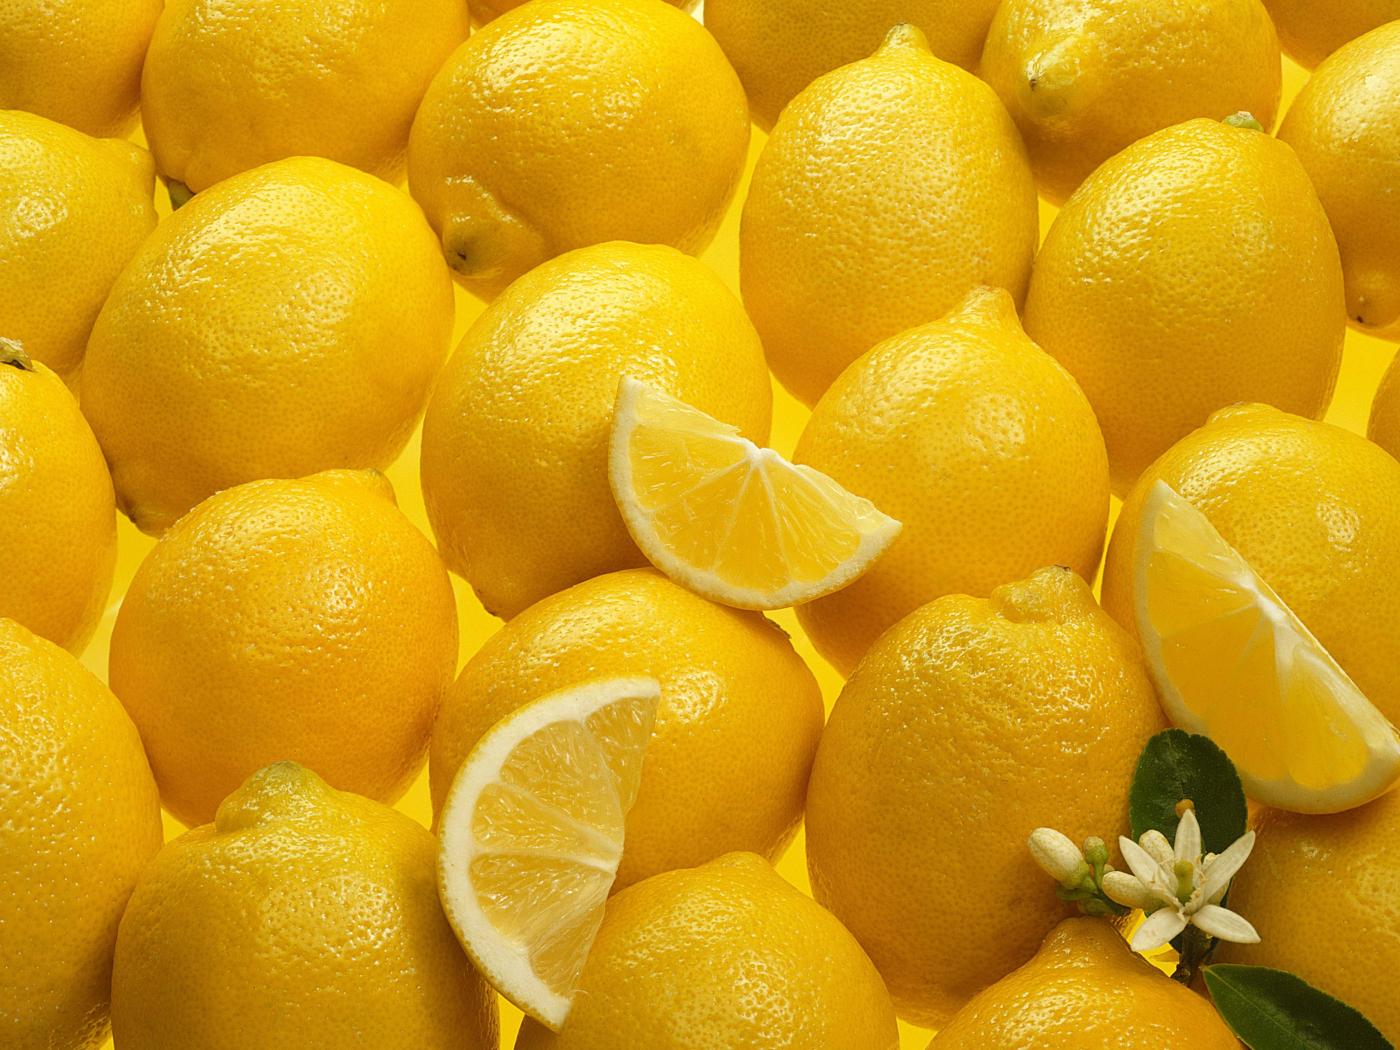 Desktop Wallpaper Lemon Fruits, Slices, Hd Image, Picture ...